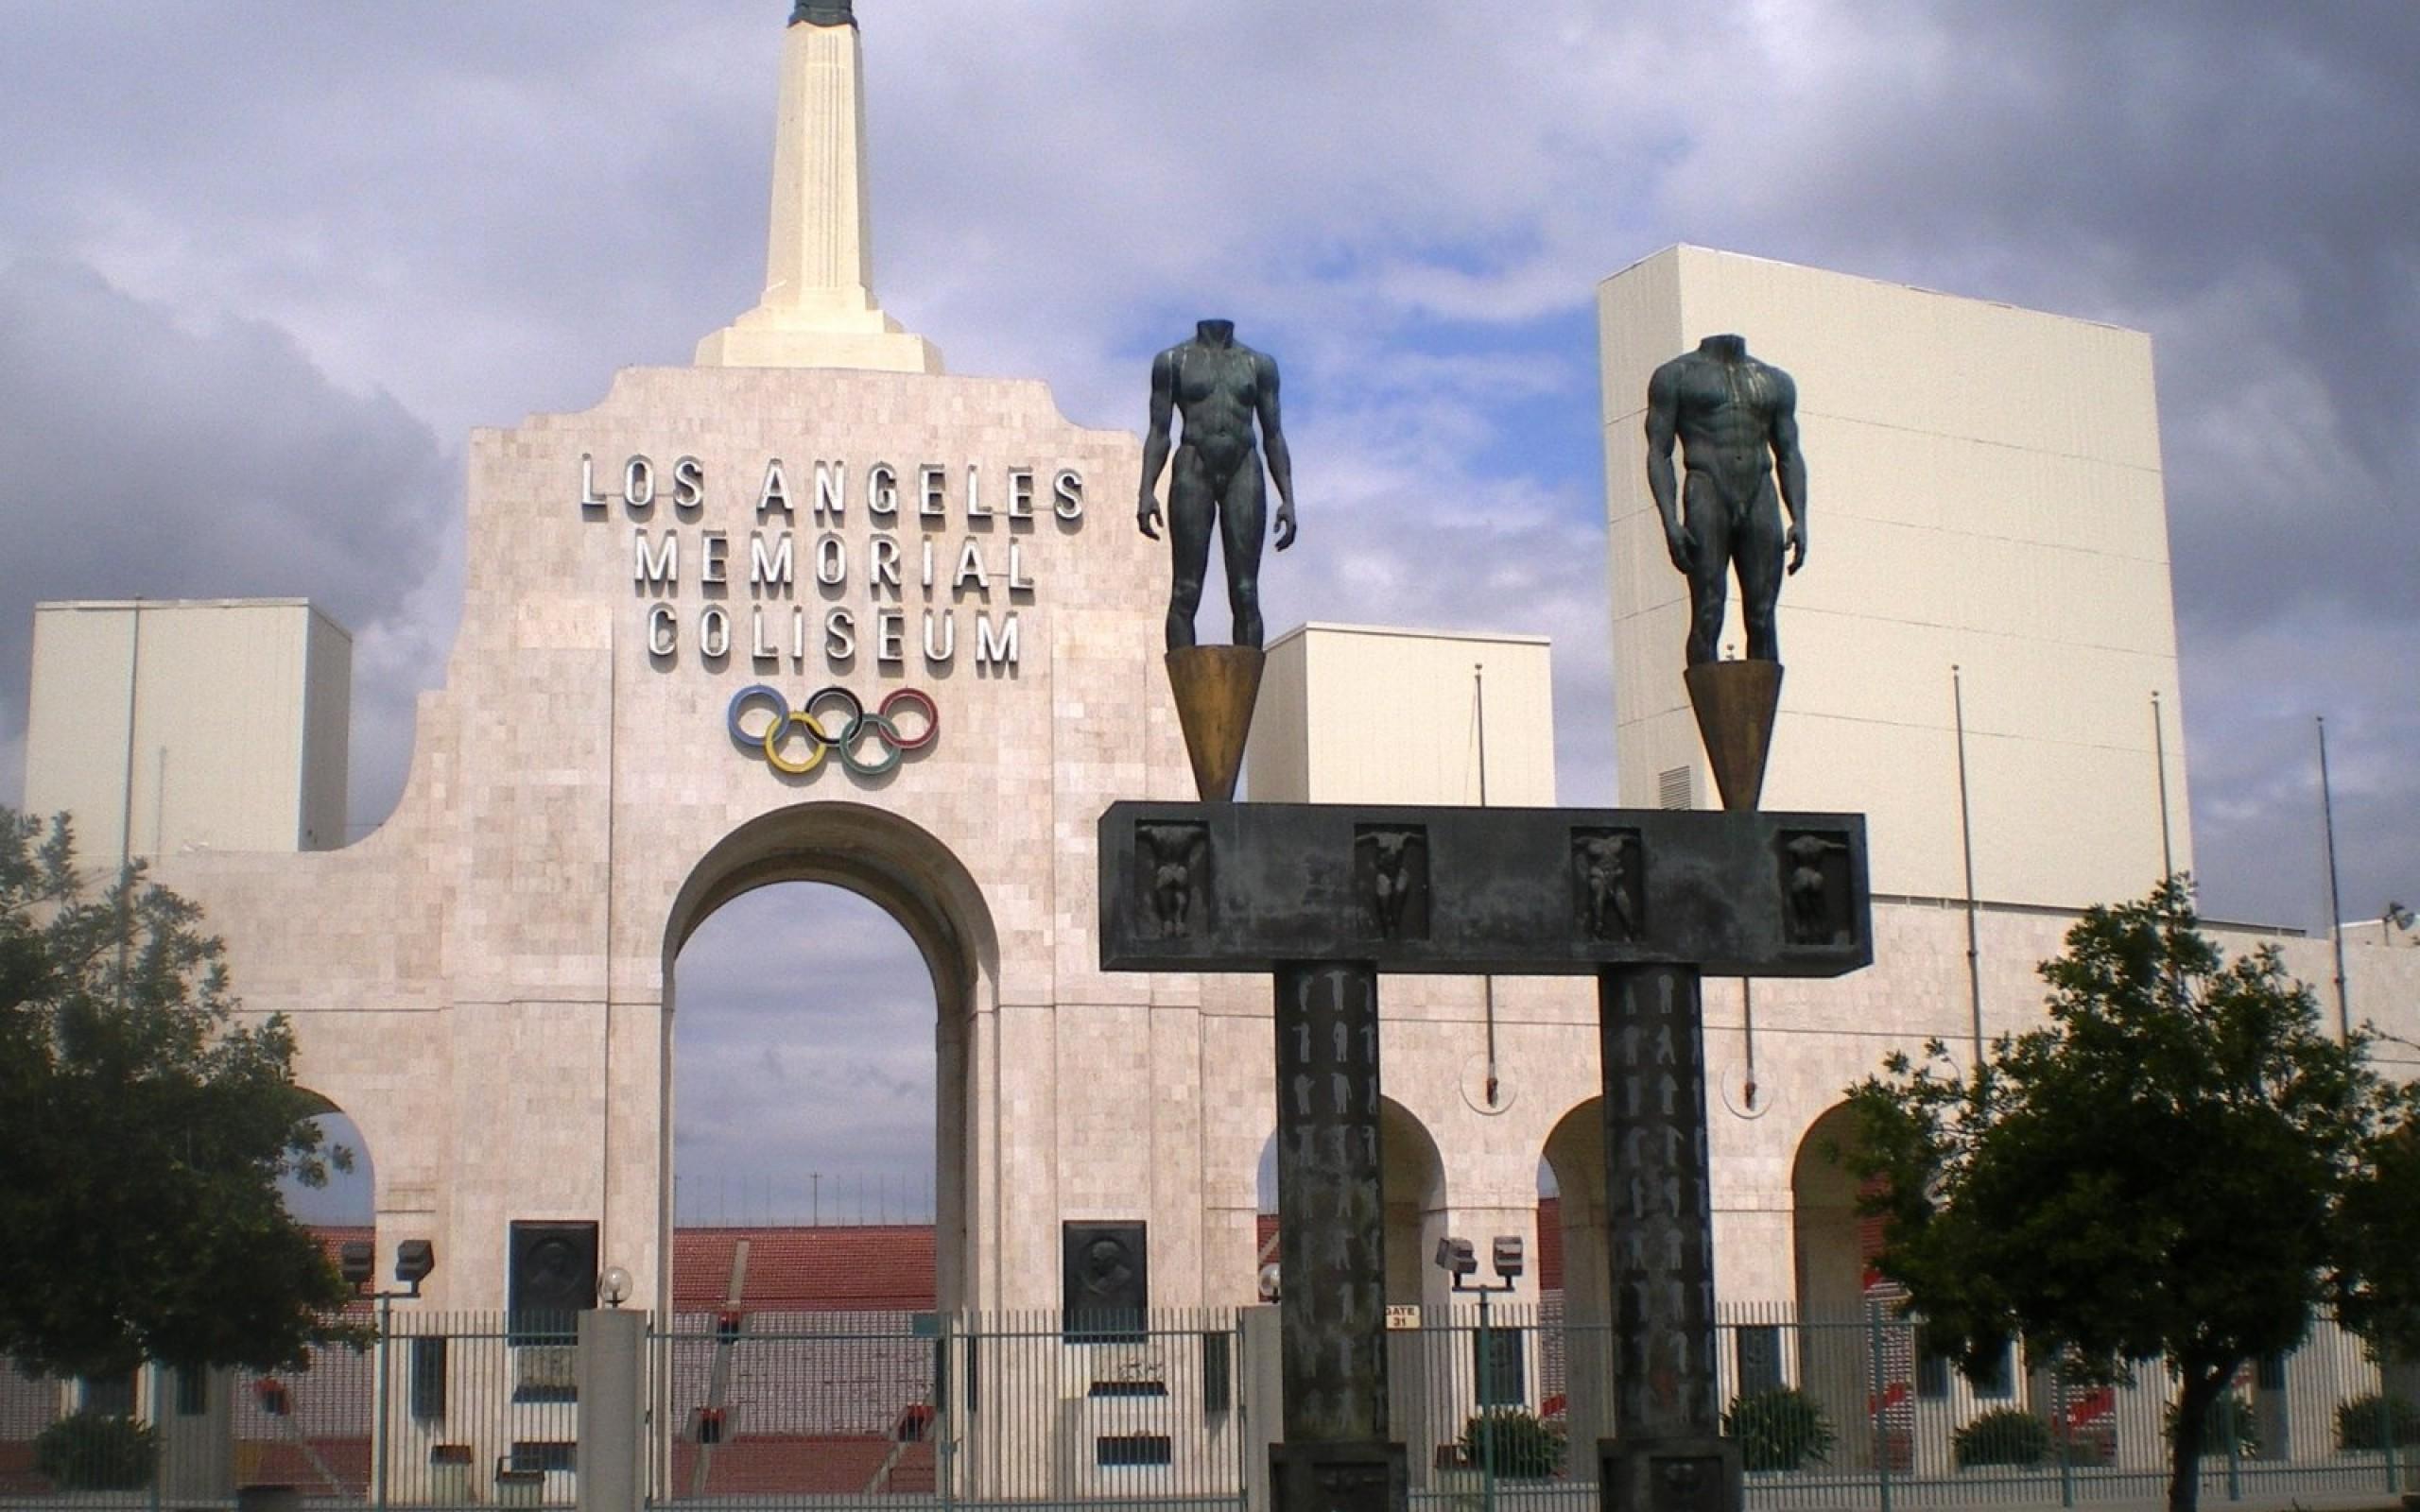 Los Angeles Memorial Coliseum HD Wallpaper